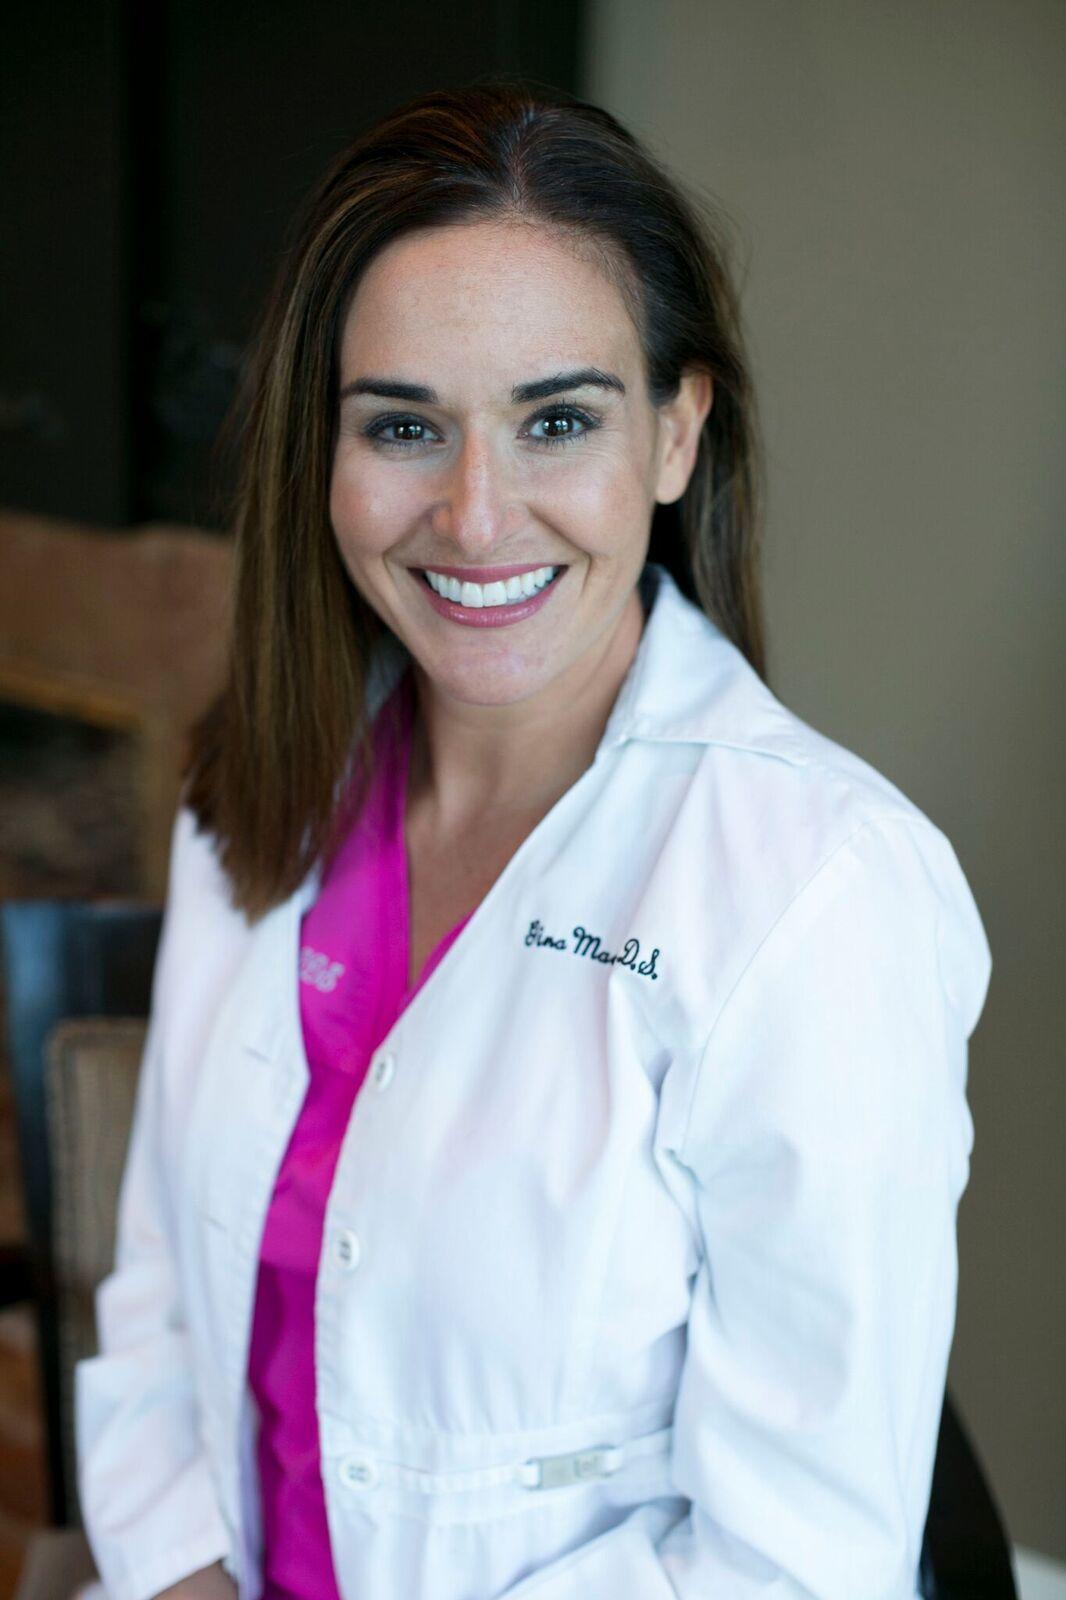 Gina Liggio Maestri, DDS Family Dentistry image 0